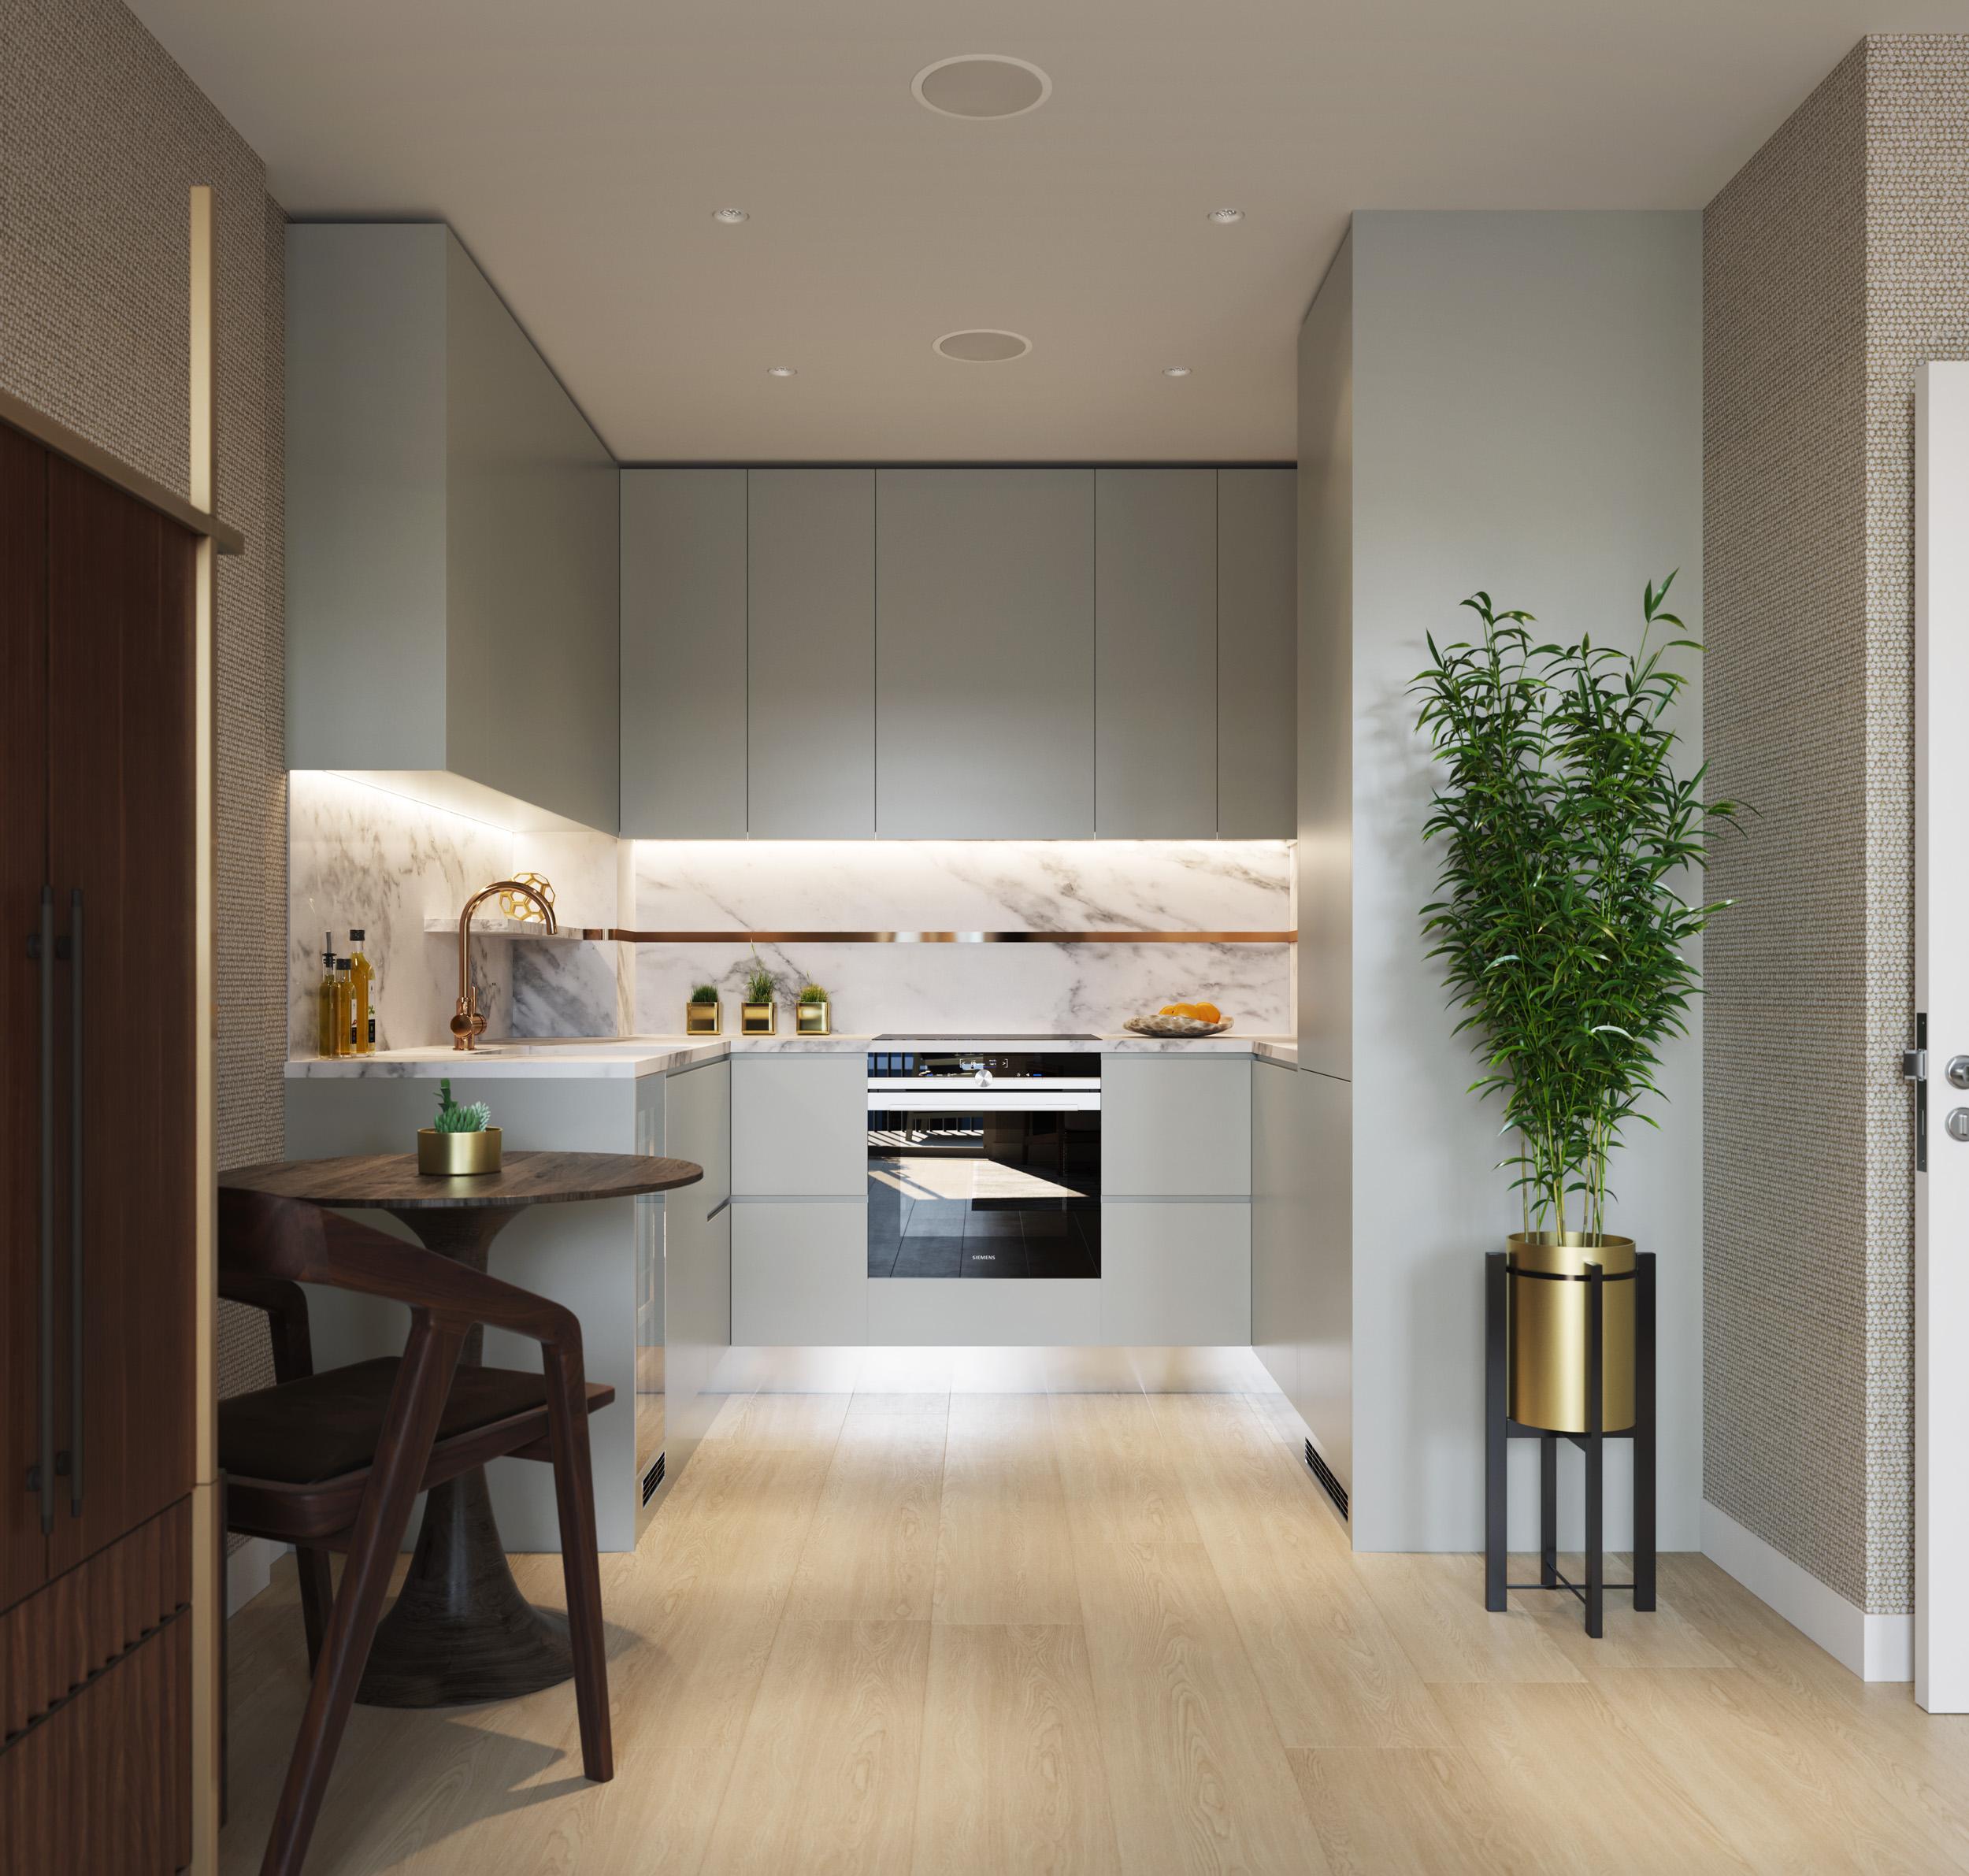 Block_C_kitchen_Final-Image_2.5k.jpg